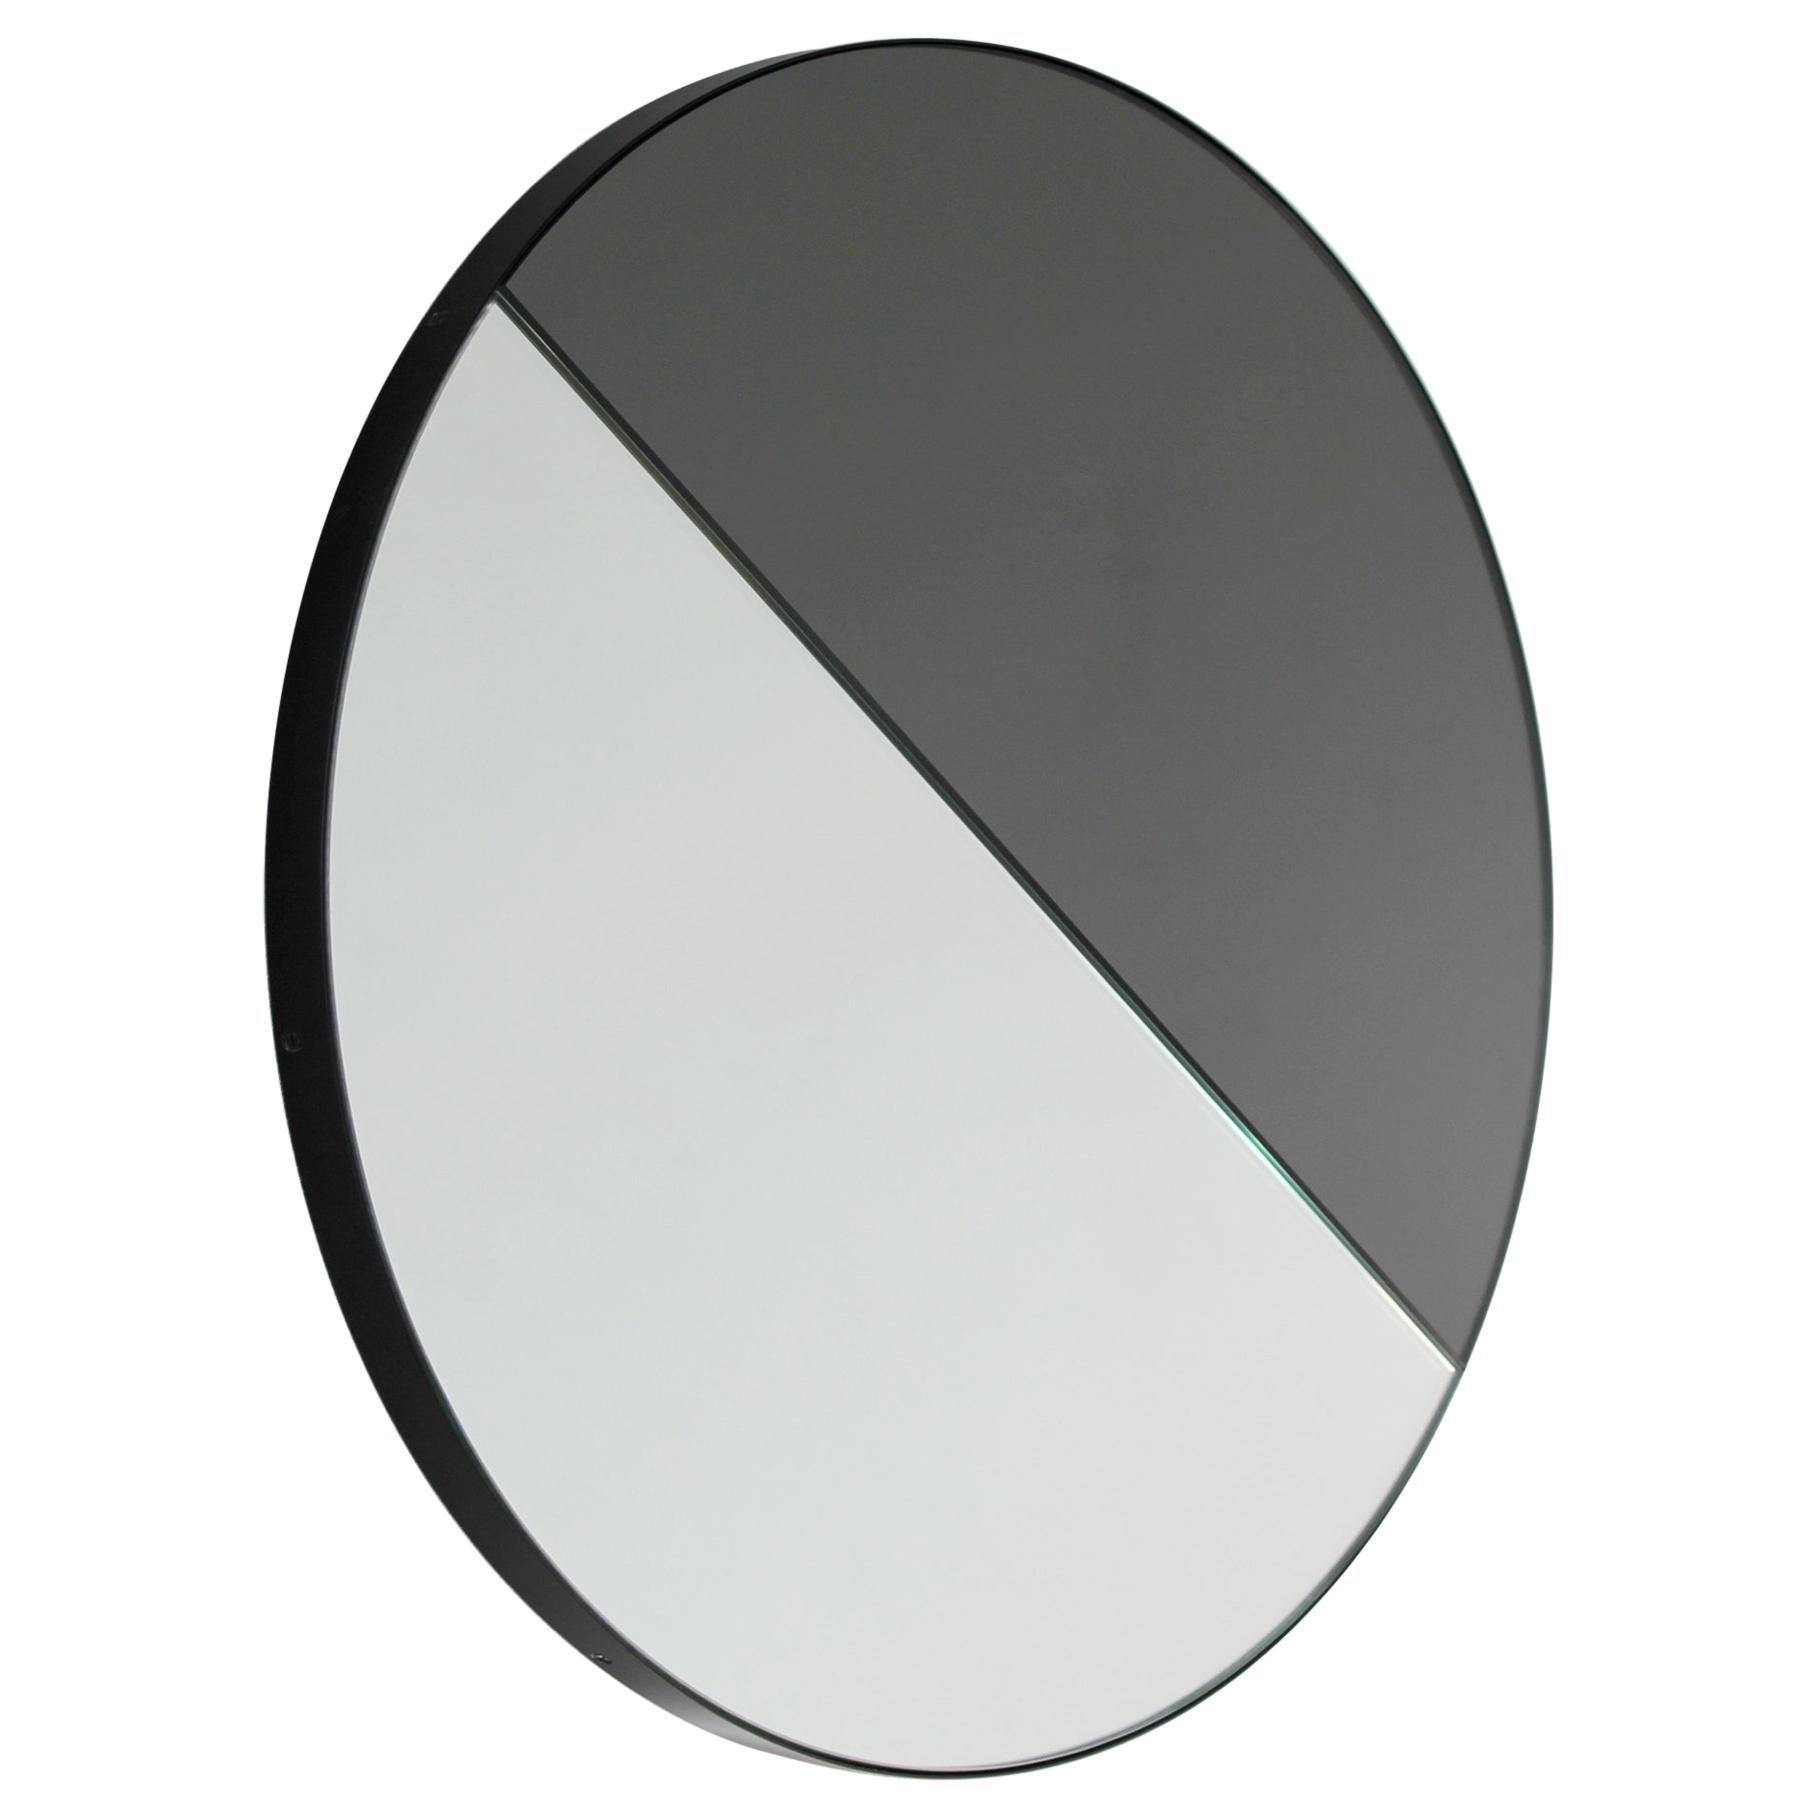 Orbis Dualis™ Mixed Tint (Silver + Black) Round Mirror with Black Frame -Regular